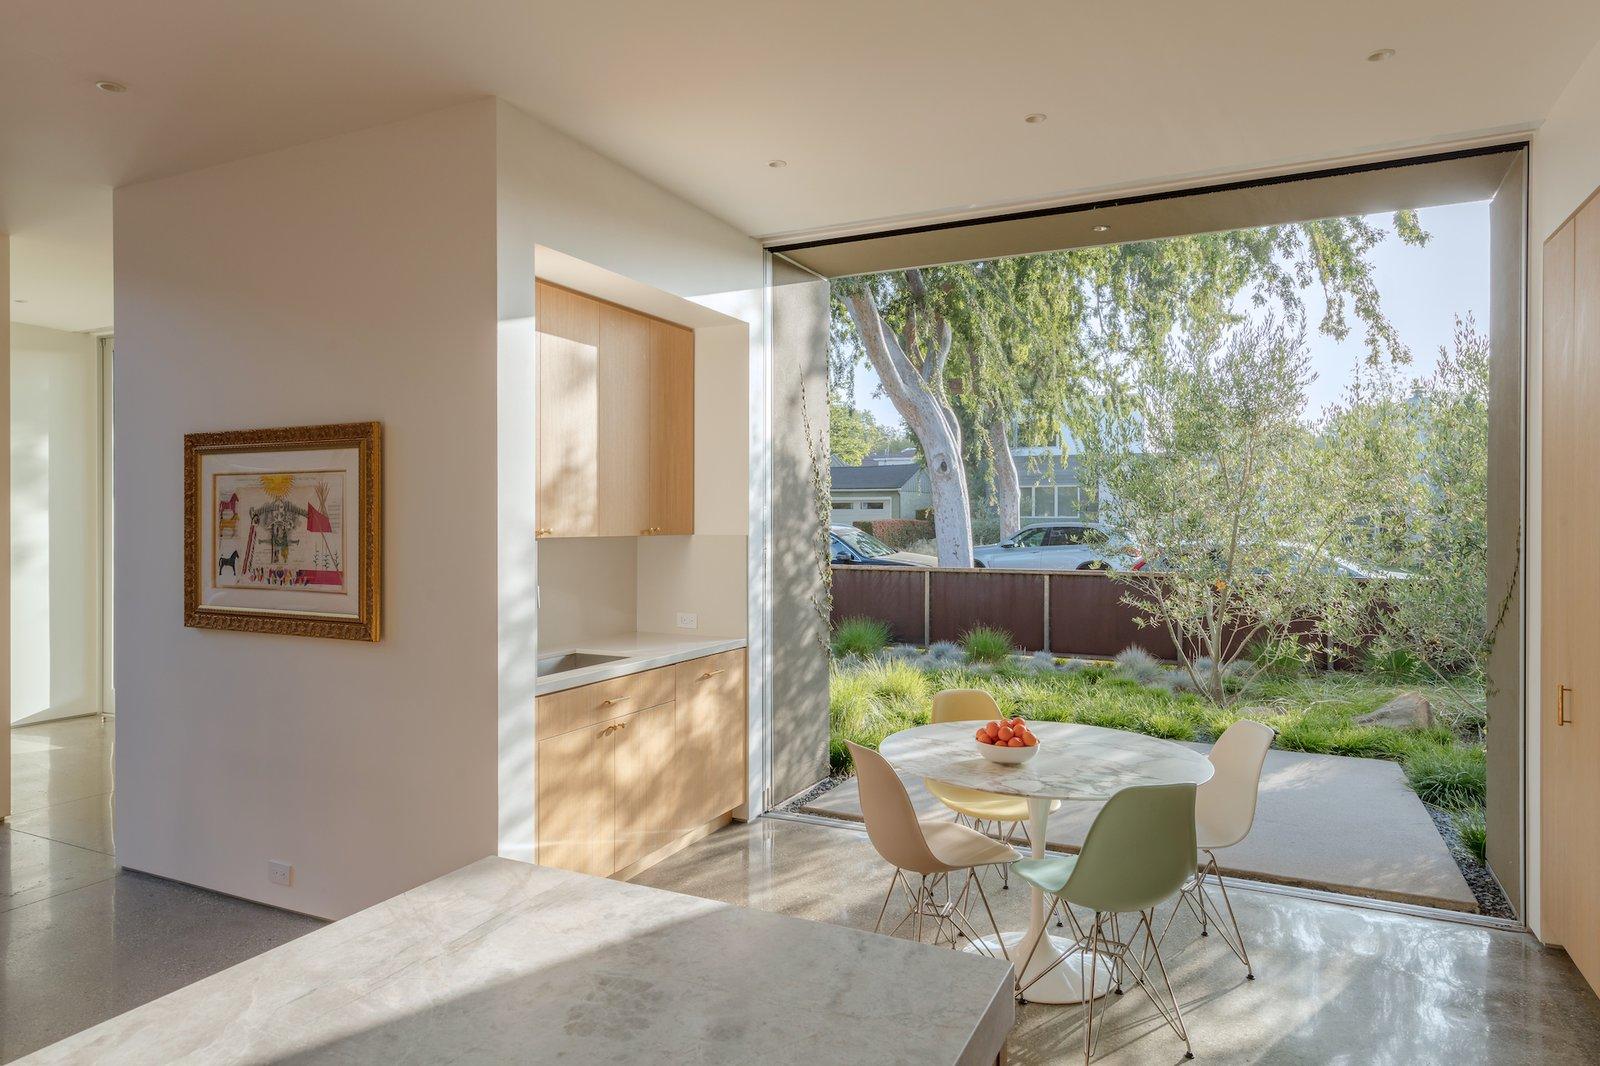 Breakfast nook of Culver City Case Study House by Woods + Dangaran